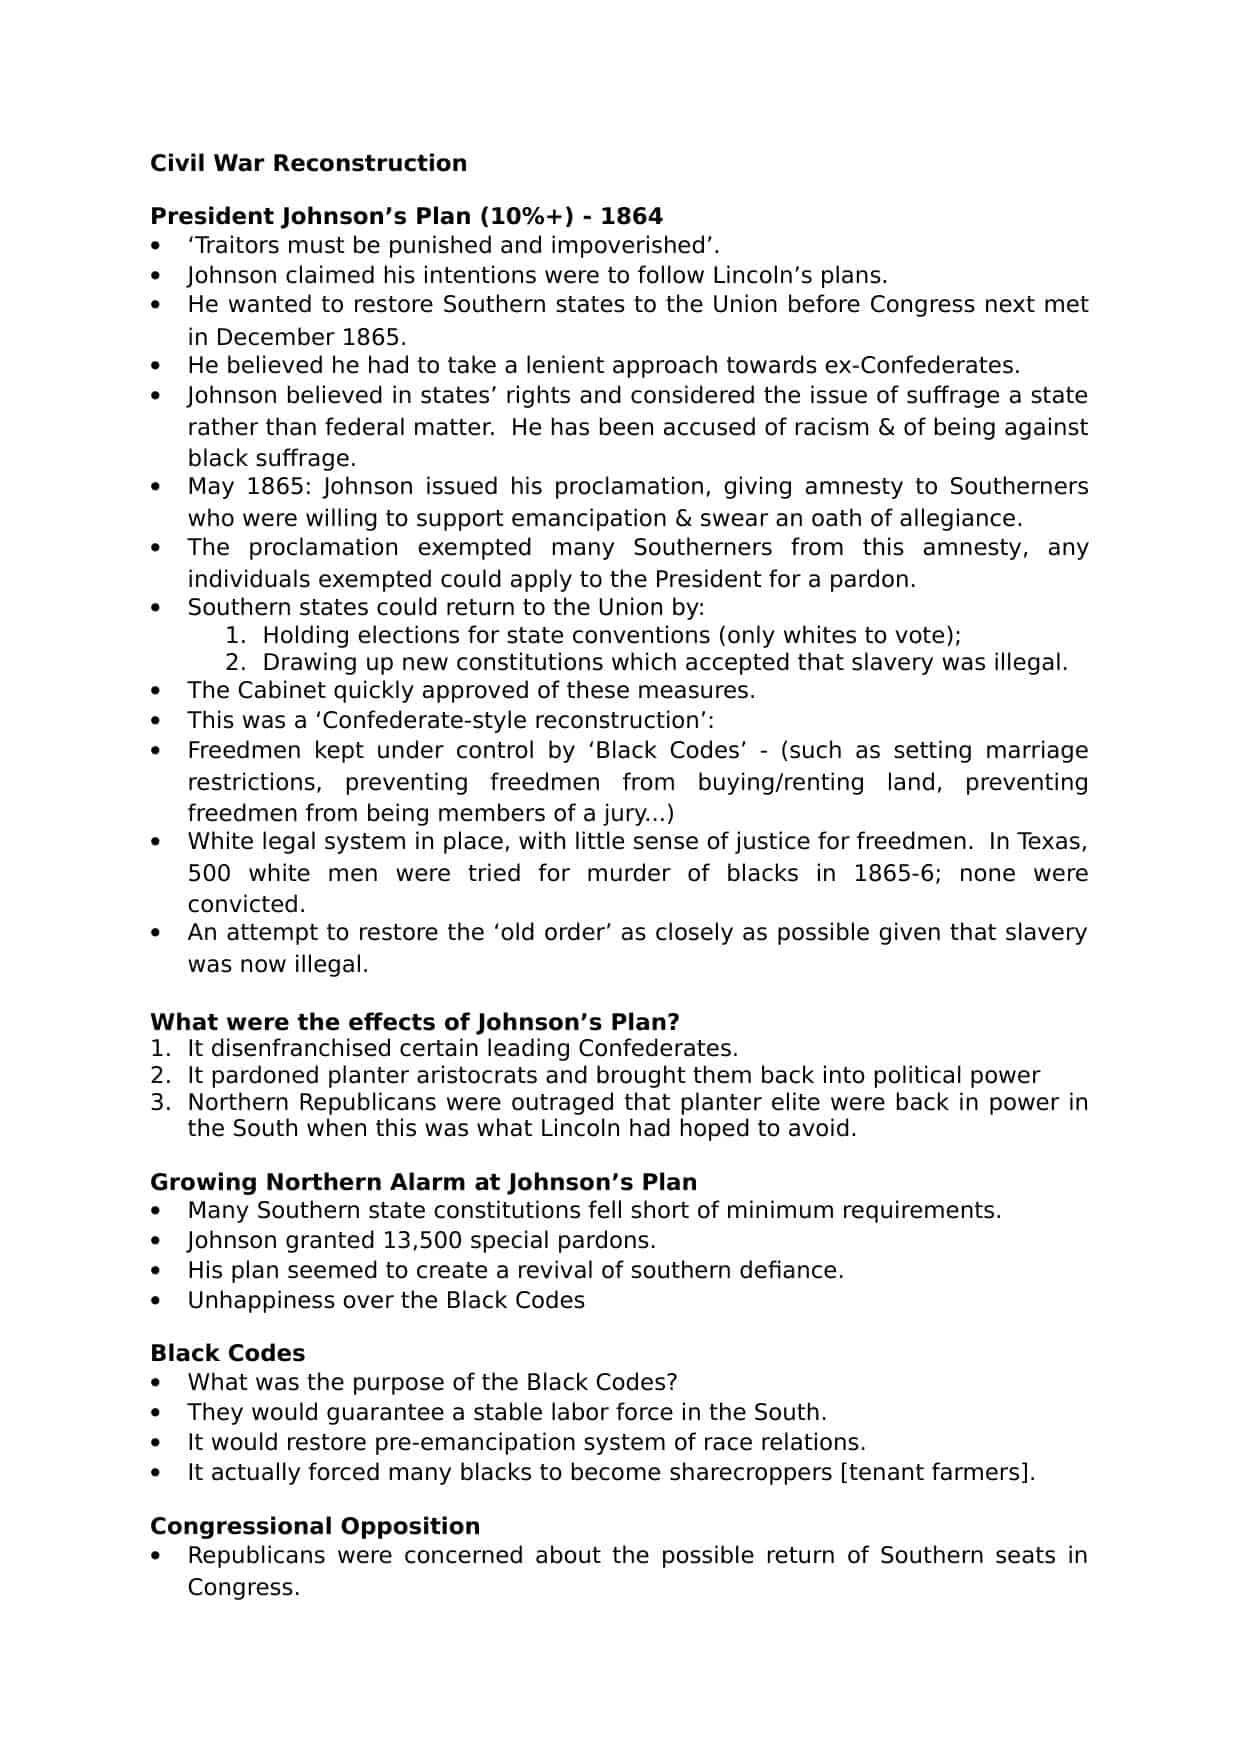 Civil War Reconstruction A Level Revision Notes